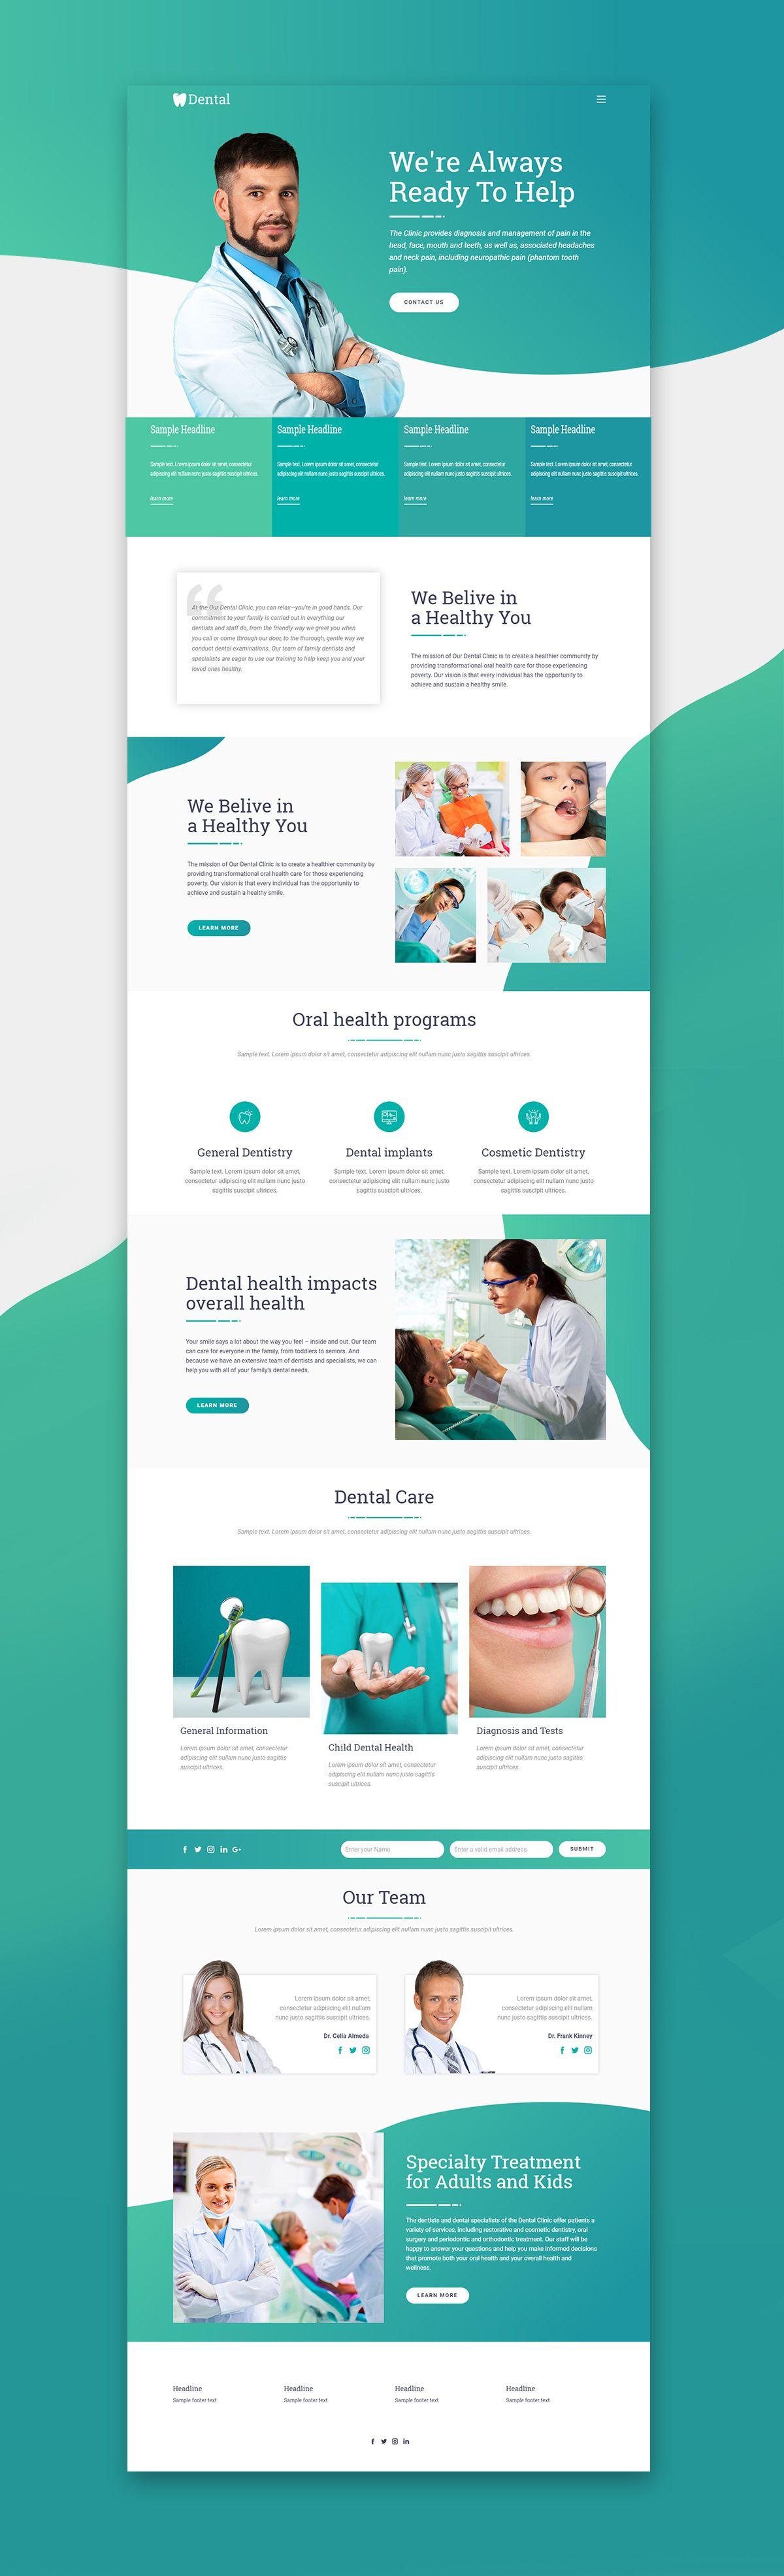 Medicine Web Template Click And Start Edit This Web Template Wordpress Theme And Joomla Template Nicepag Medical Website Design Web Design Tips Web Design